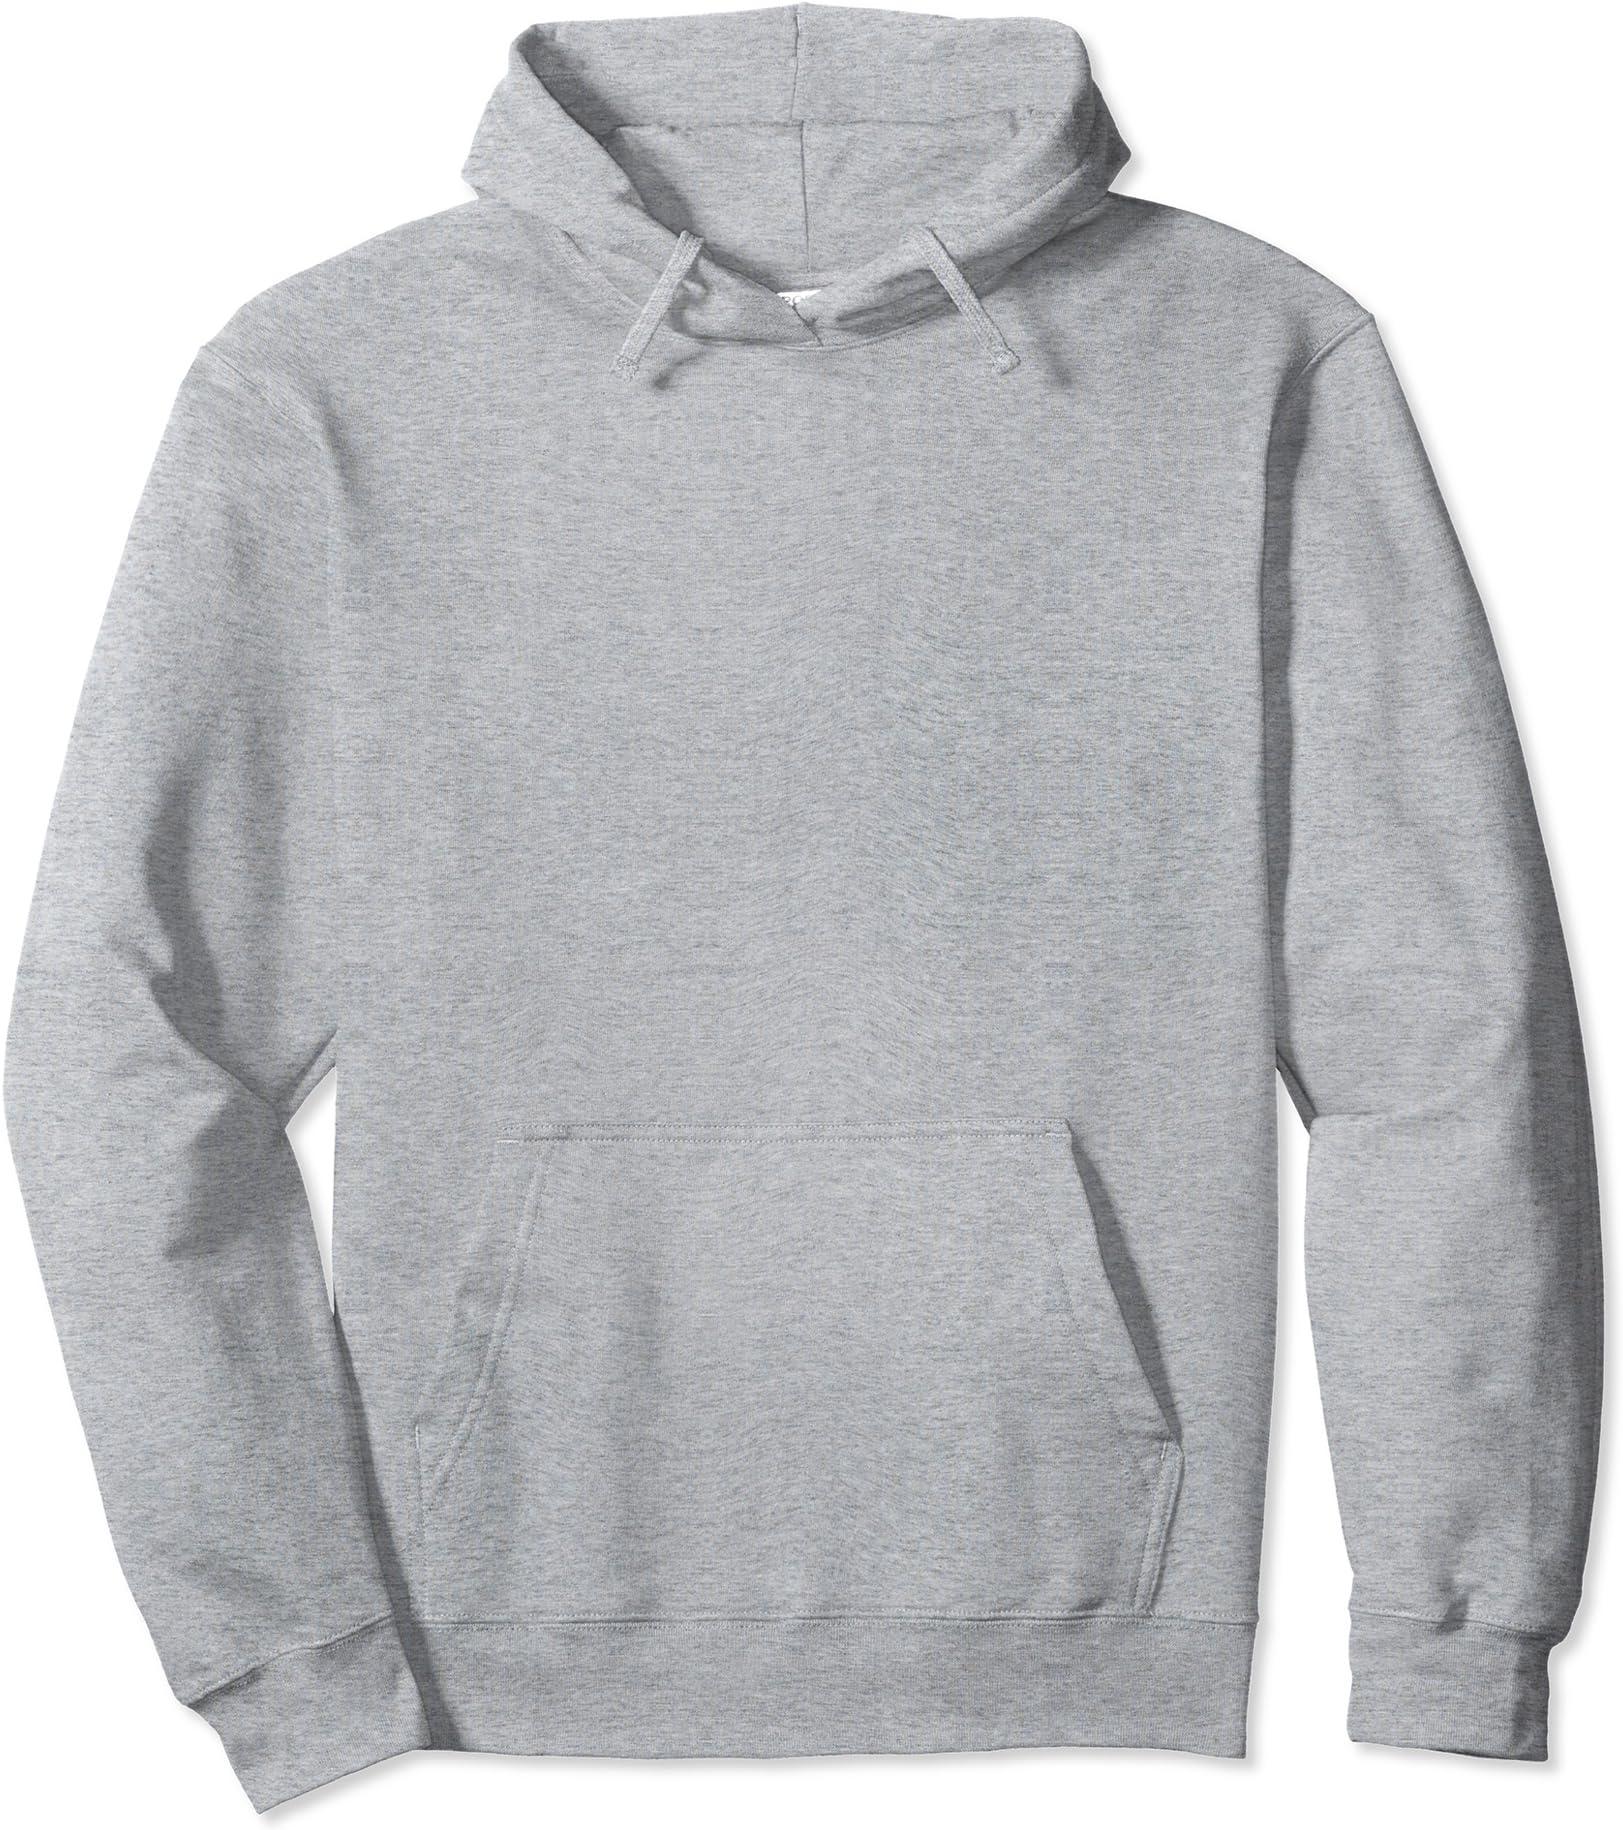 Harry Potter SLYTHERIN CREST Licensed Adult Sweatshirt Hoodie